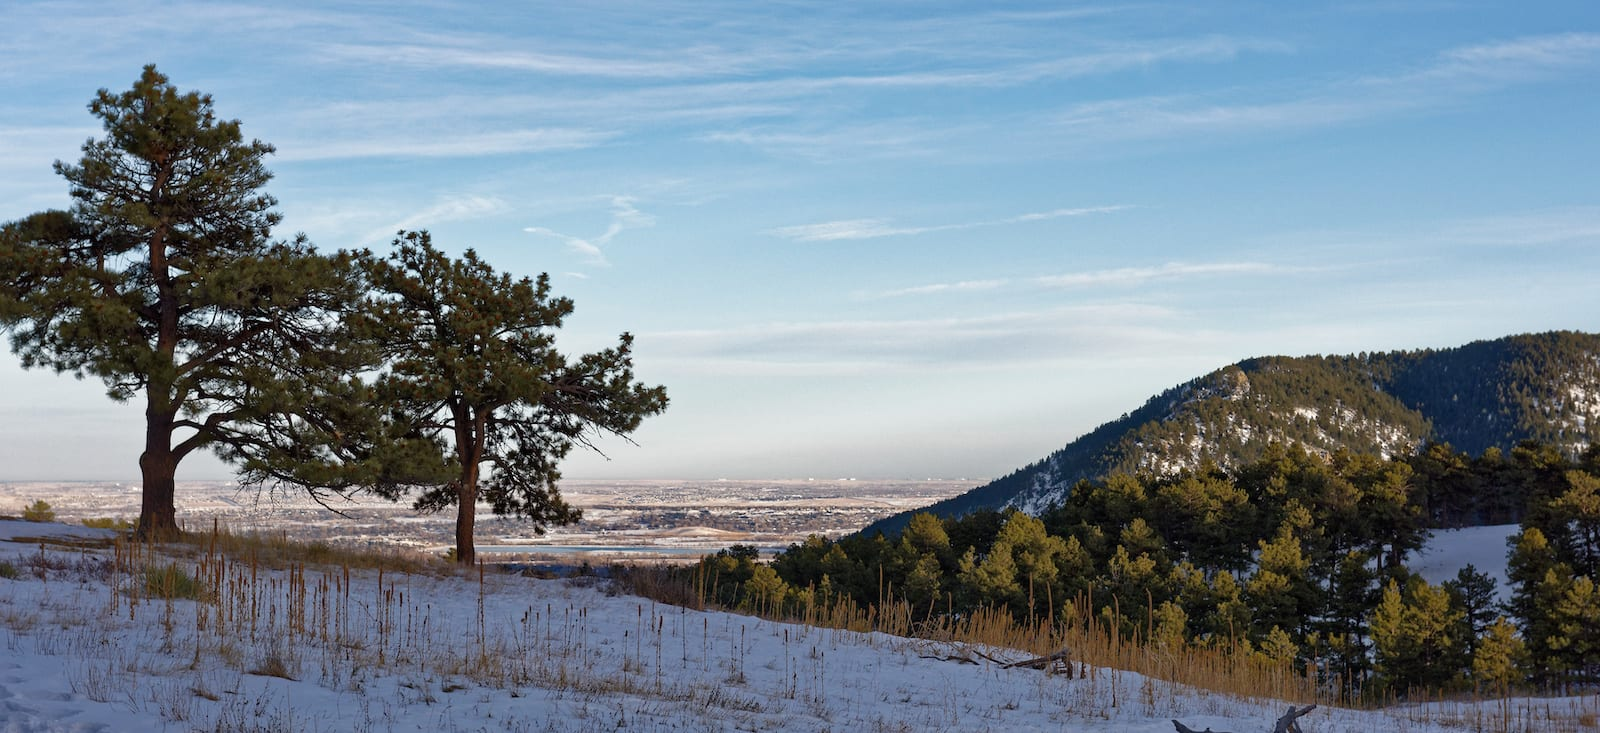 Betasso Preserve Snowshoeing Trail Colorado